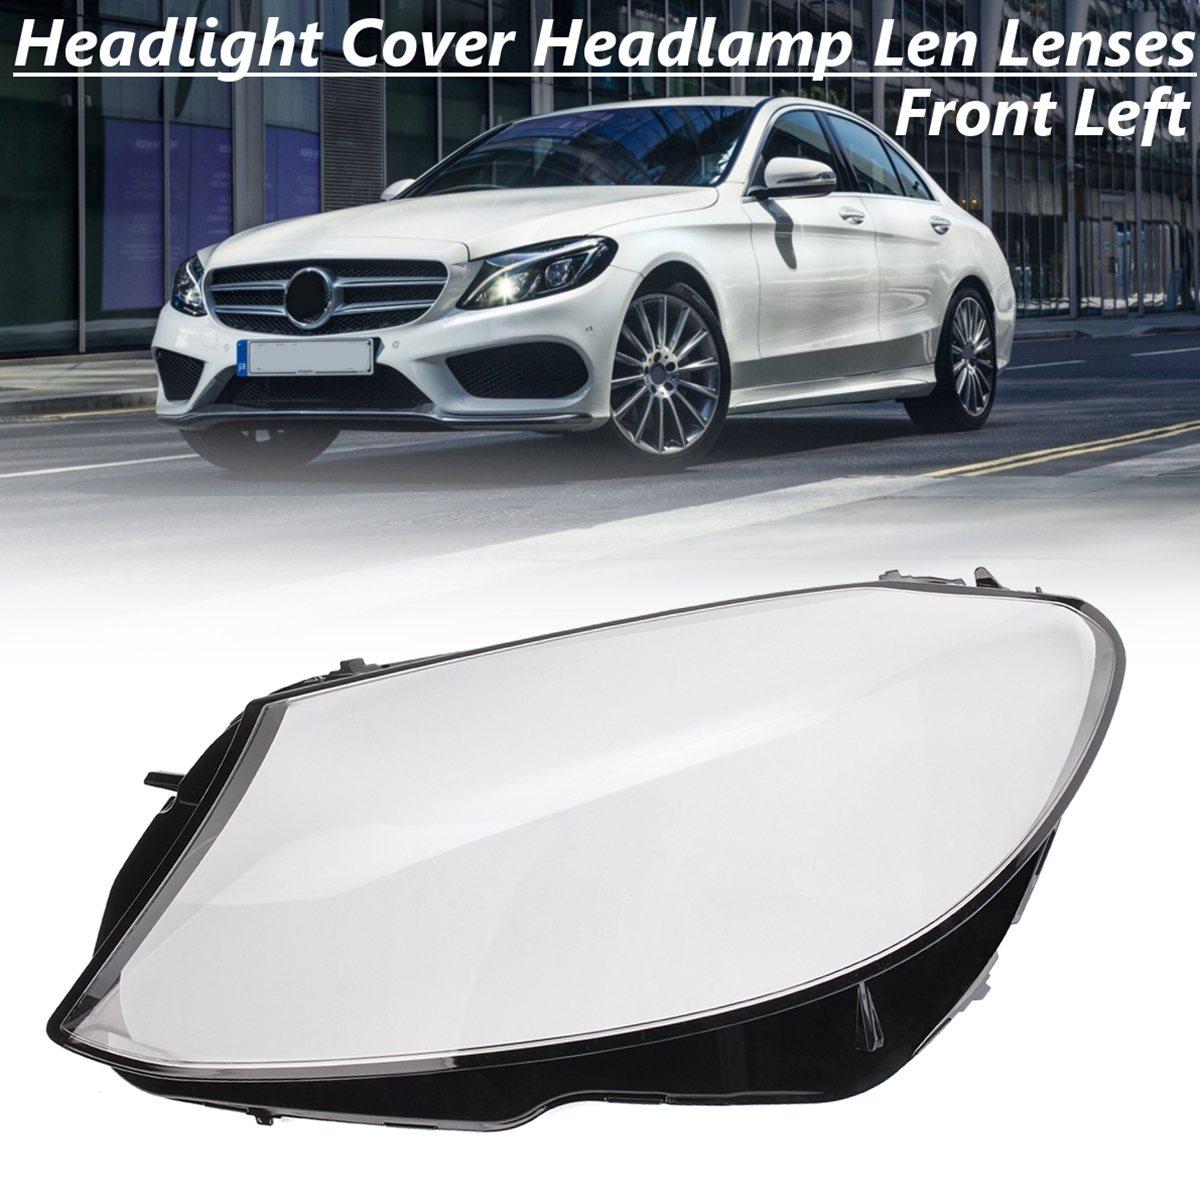 Front Left Headlight Headlamp Len Plastic Lenses Shell Cover For Mercedes/Benz C180 C200 C260L C280 C300 W205 2015 2016 2018 mewant black suede car steering wheel cover for mercedes benz c180 c200 c350 c300 cls 280 300 350 500 glk 300 2008 2010